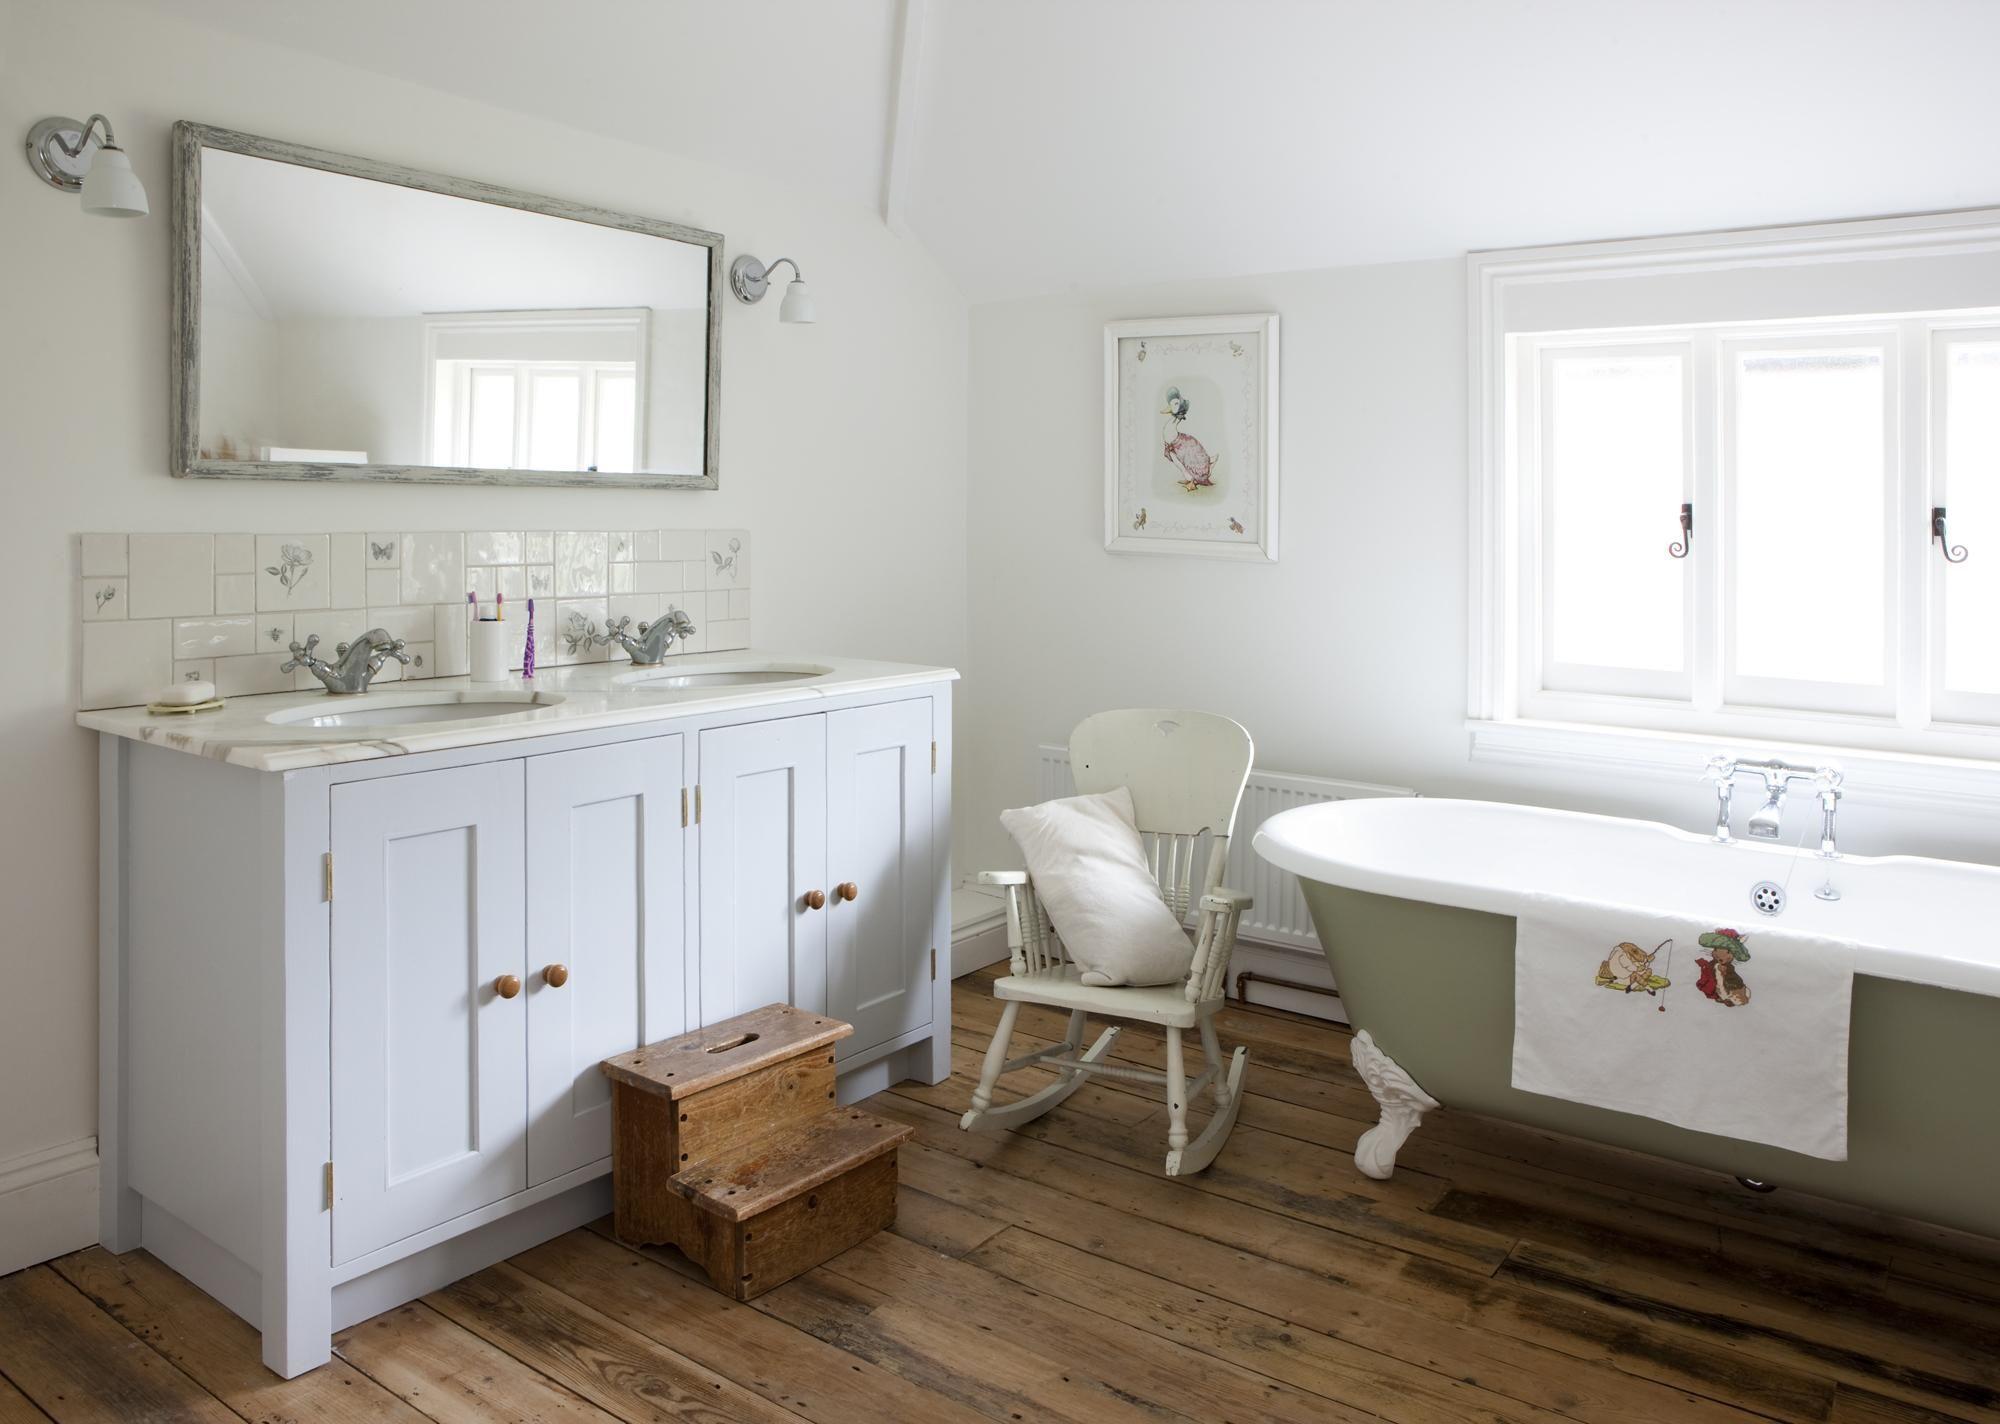 Bespoke Bathroom Vanity with Marble Top and Roll Top Bath B